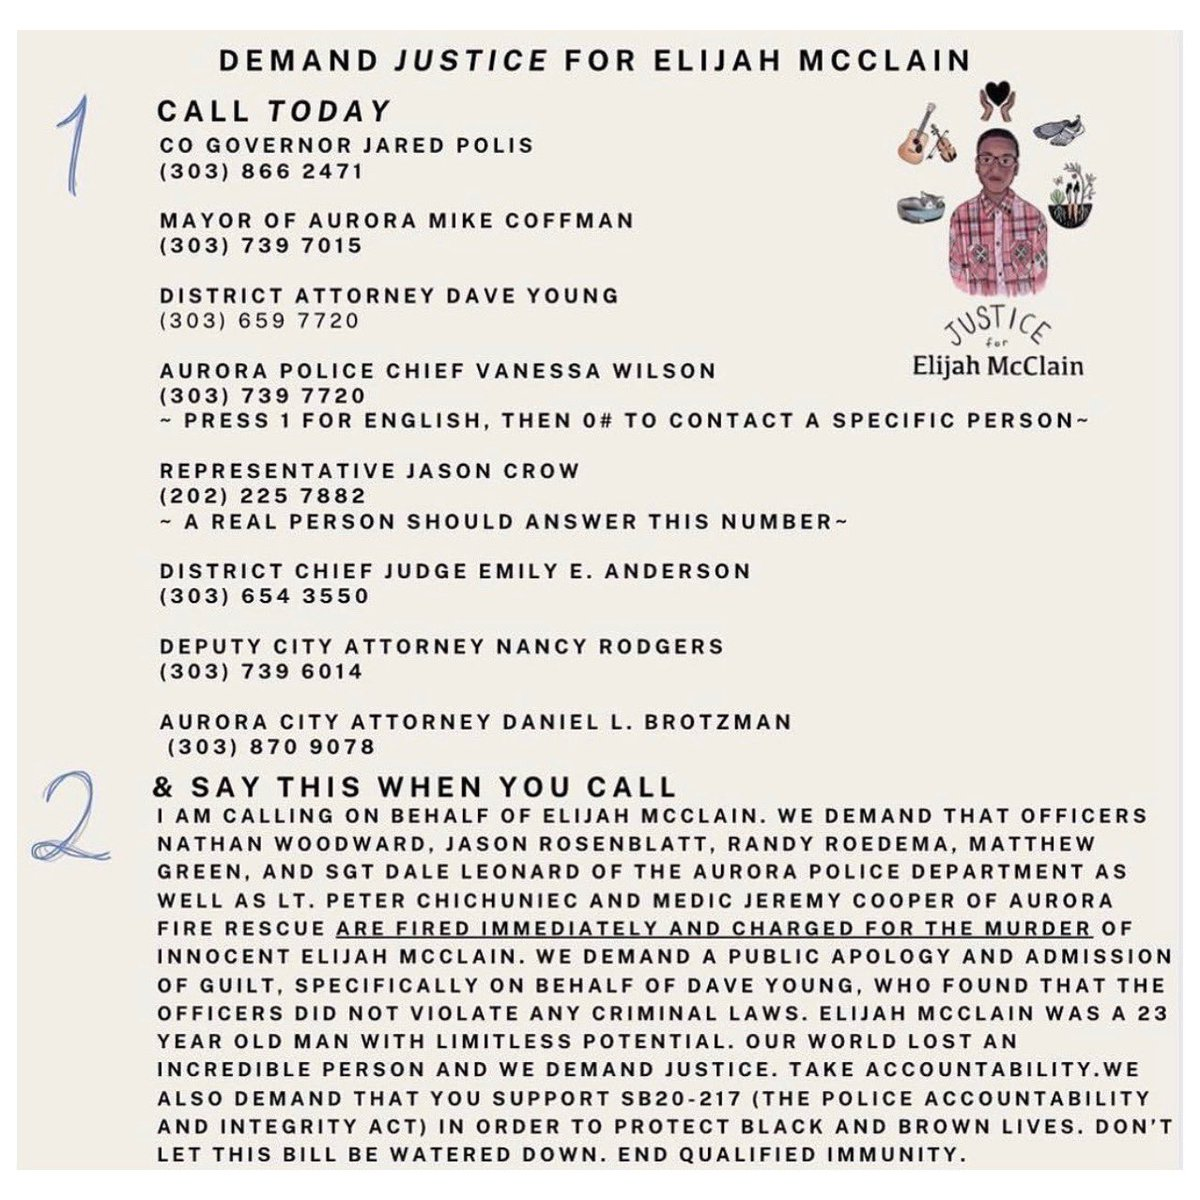 #JusticeForElijahMcClain